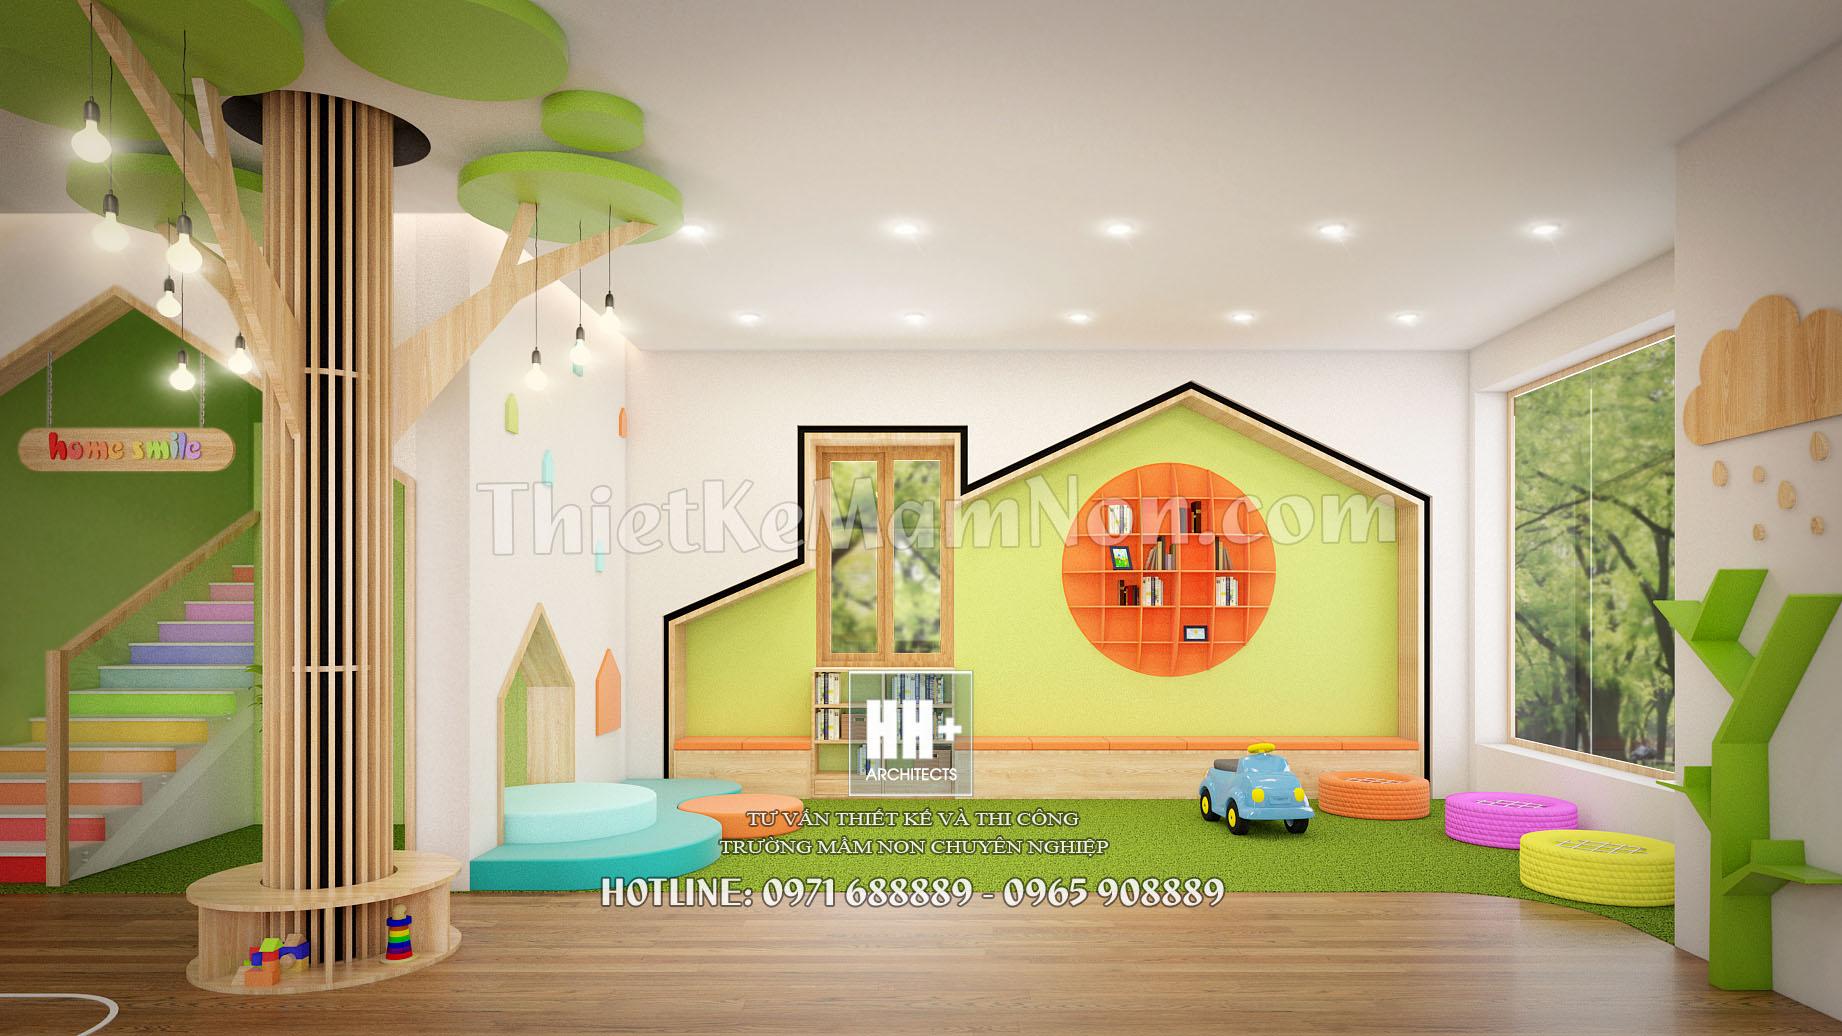 1 thiết kế trường mầm non montessori Thiết kế trường mầm non montessori Việt Anh 1 1